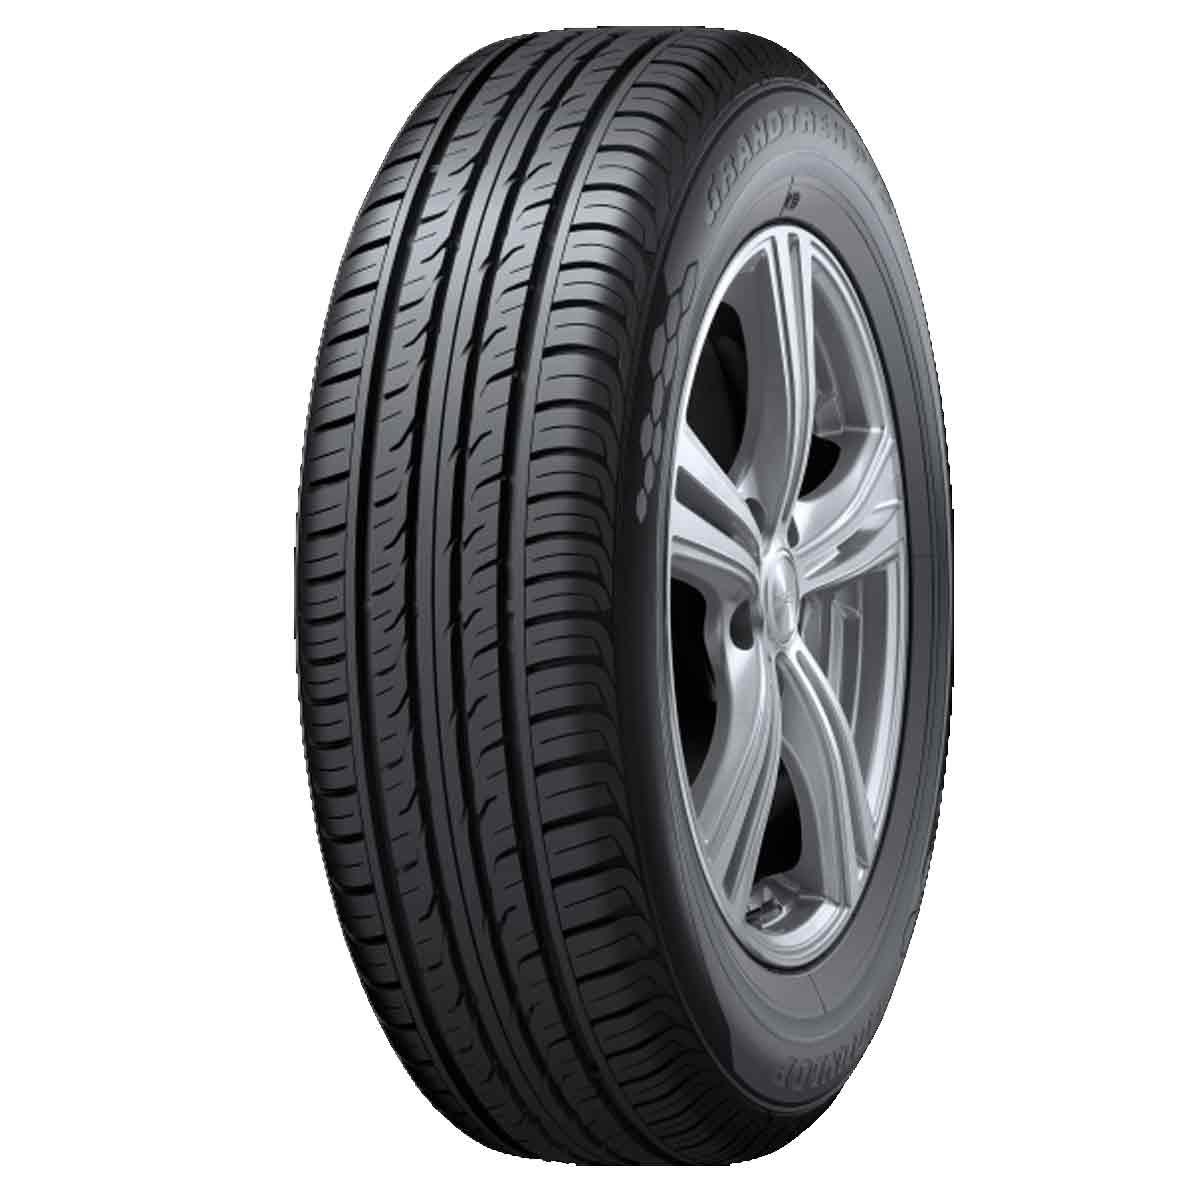 Pneu Dunlop 225/65r17 102V Grandtrek PT3